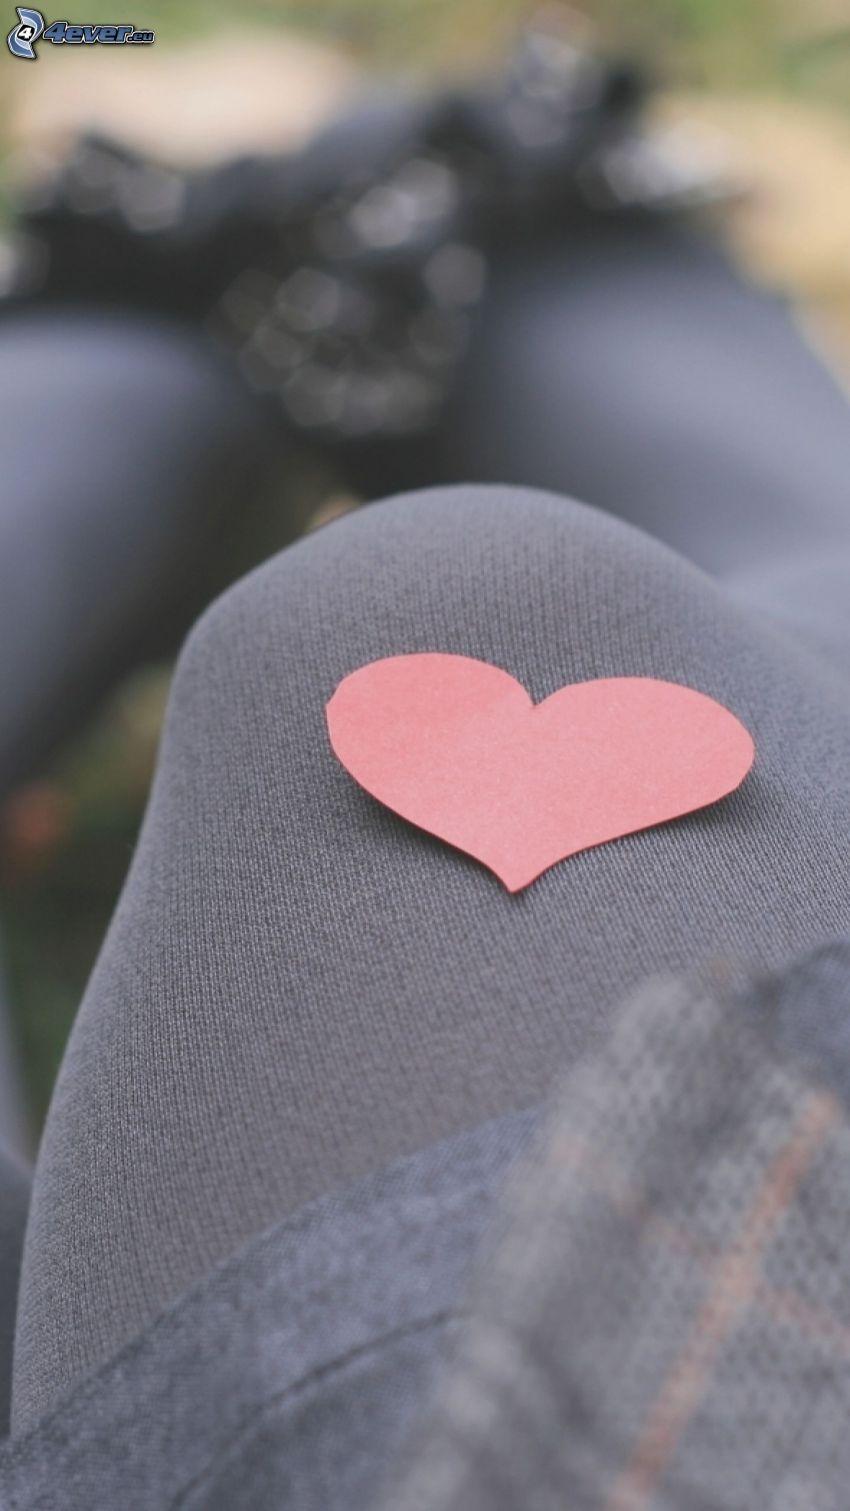 papierowe serce, stopa